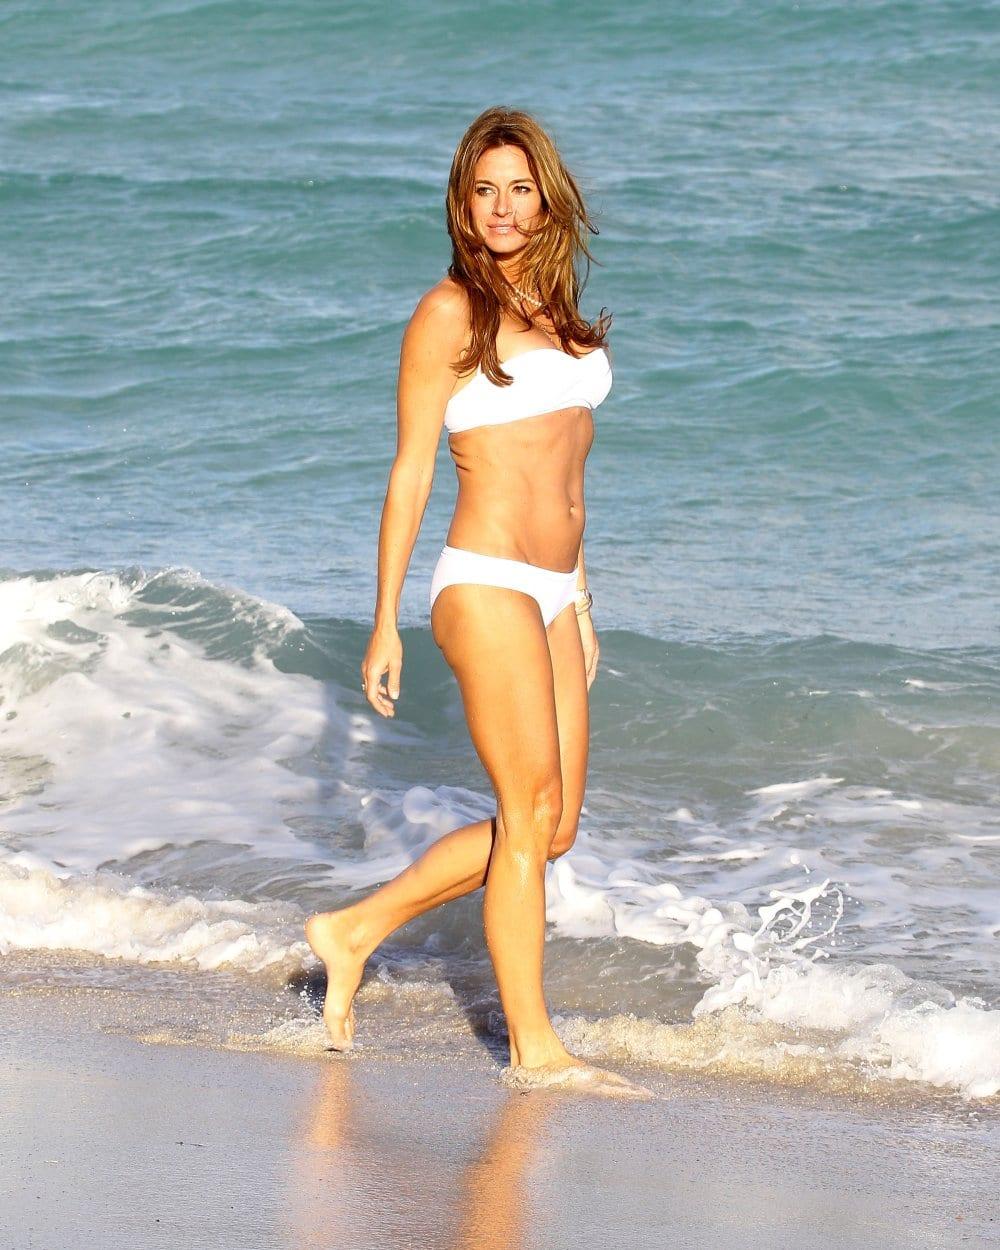 Jeanette brox nude xxx gallery